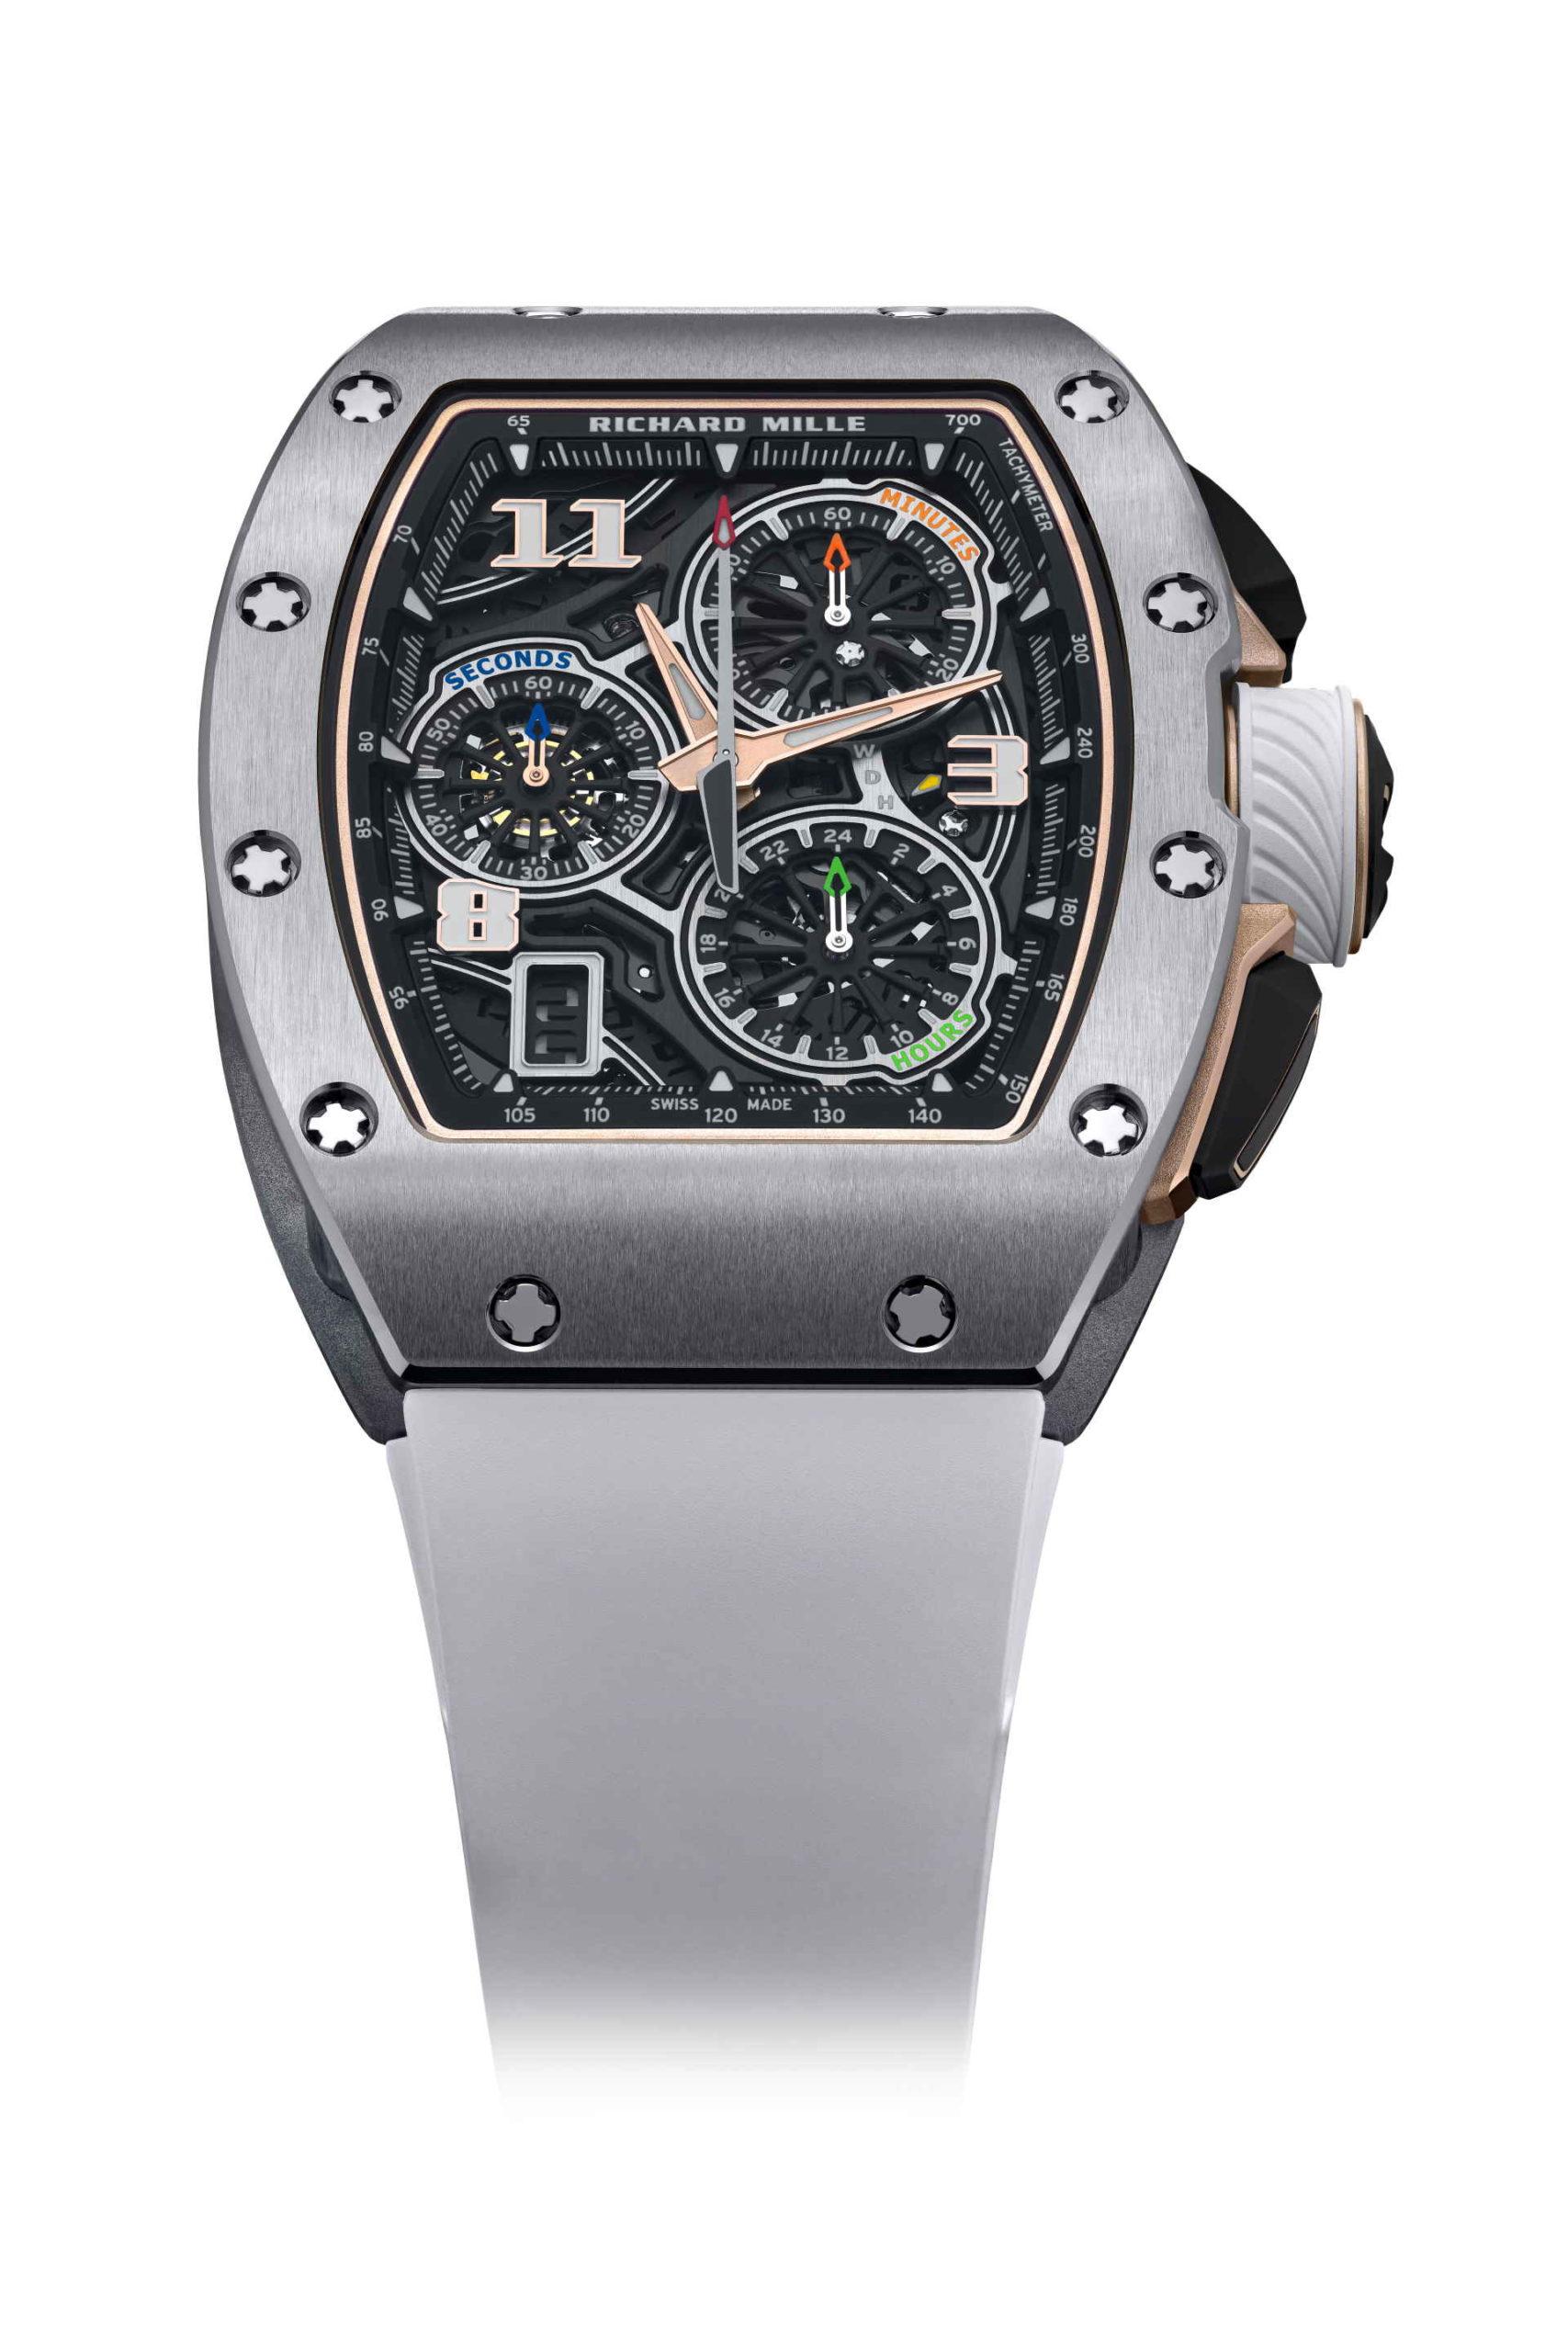 Richard Mille RM 72-01 Chronograph